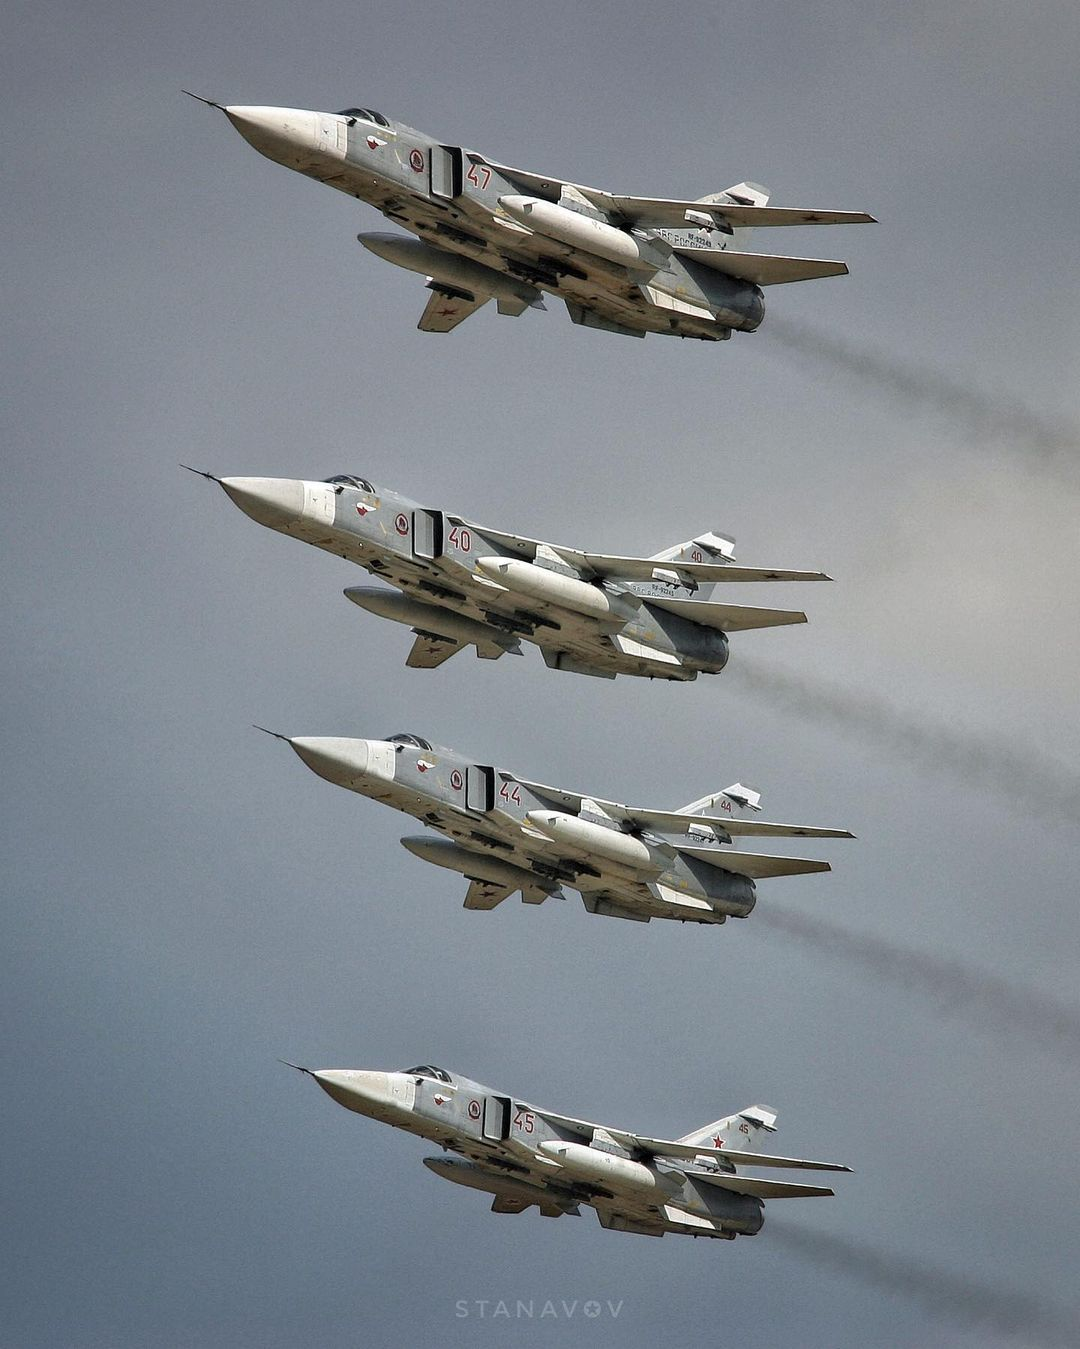 Su-24 Fencer - Page 6 E-3osIfXoAUZNrX?format=jpg&name=large